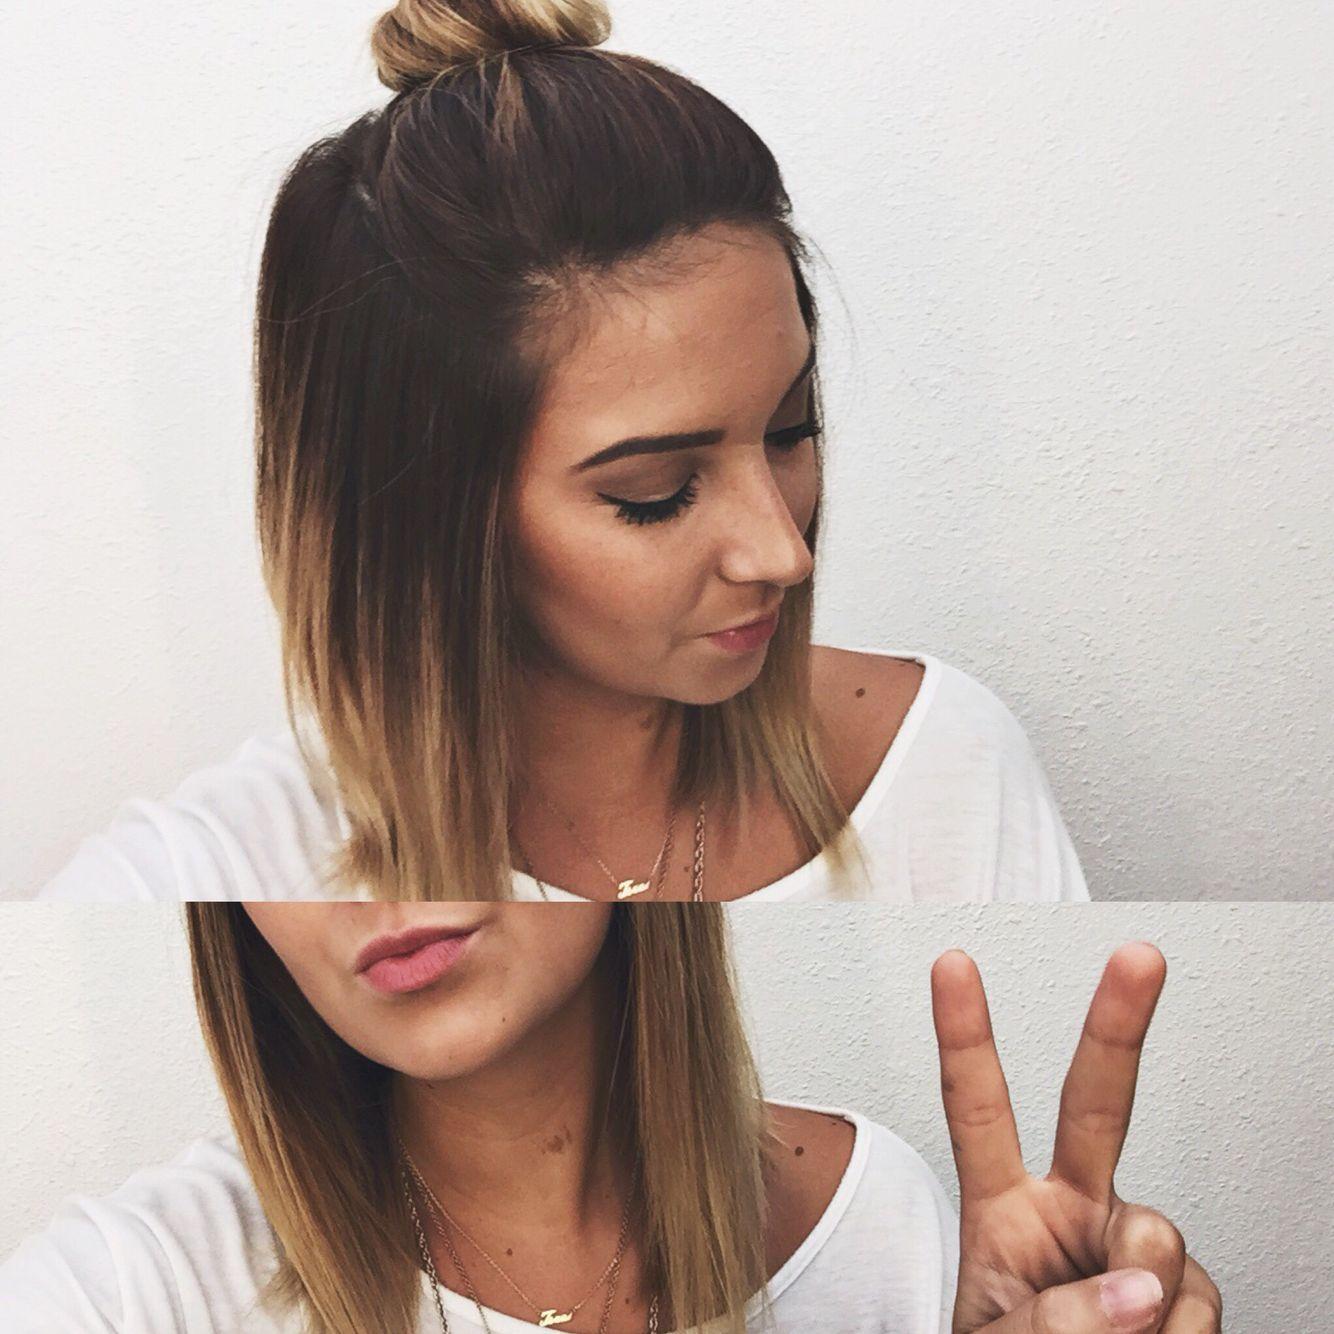 Short Ombre Hair Top Knot Bun Short Ombre Hair Short Hair Balayage Short Hair Styles